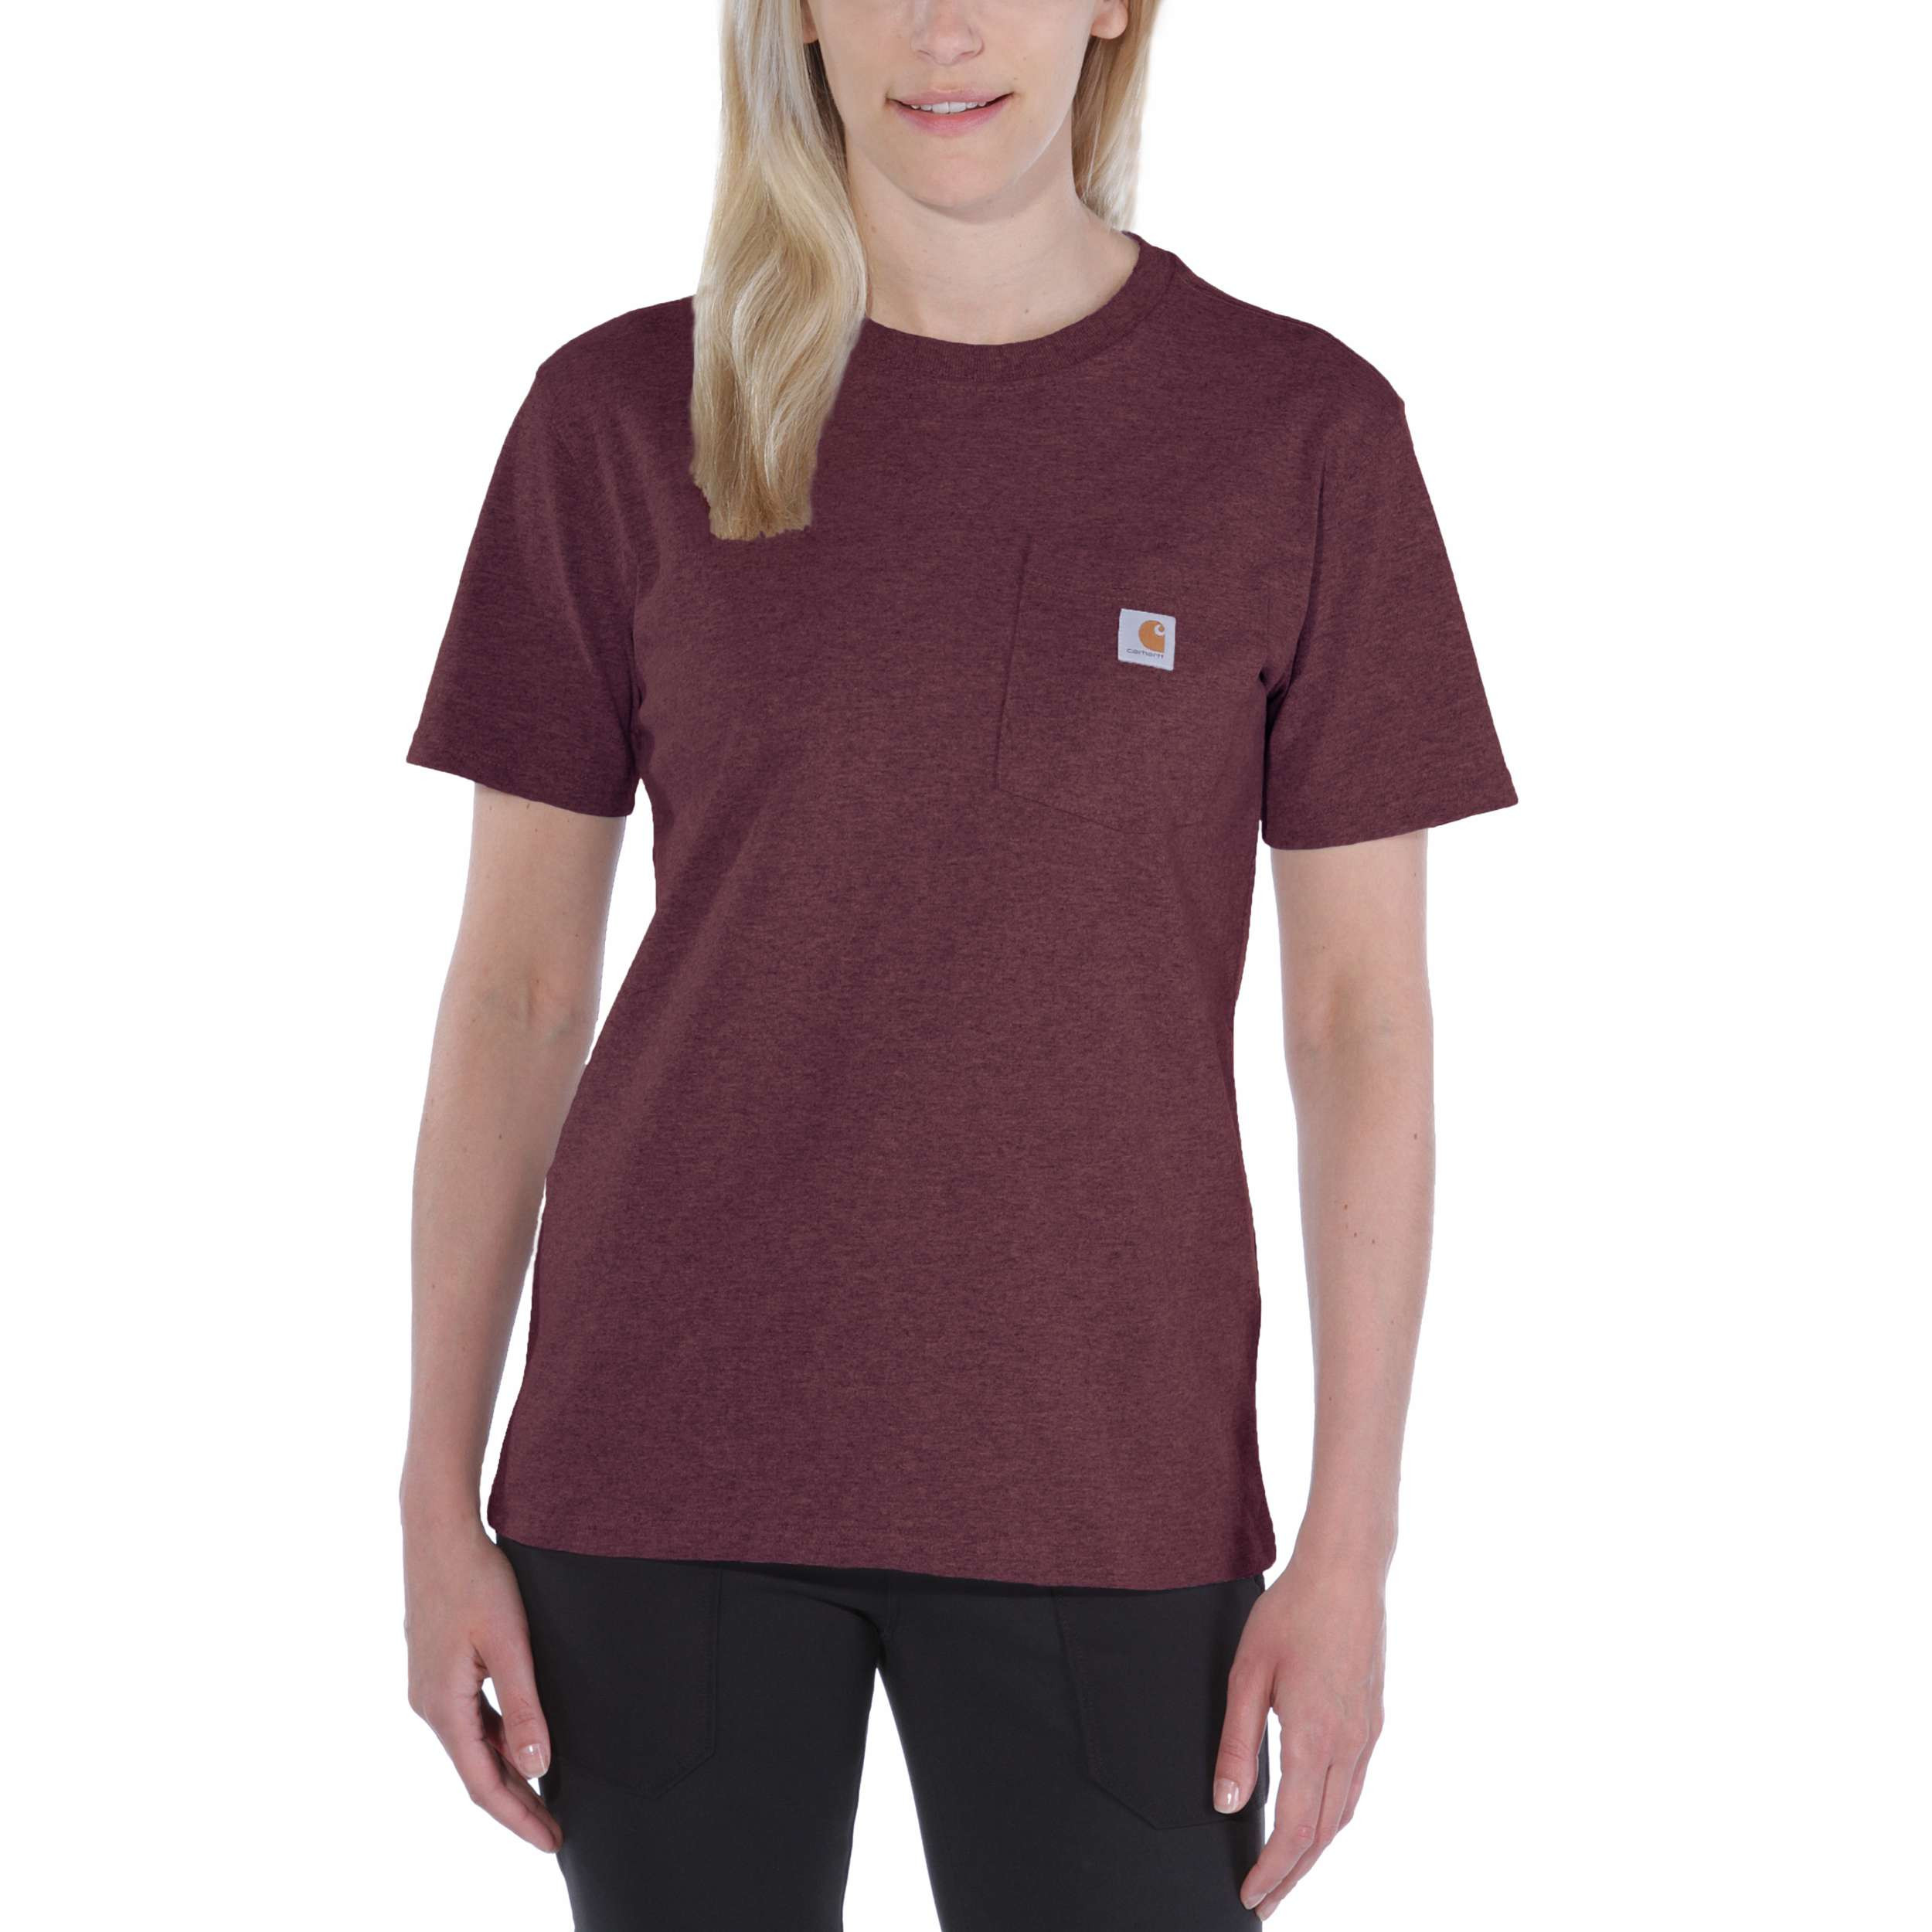 Футболка женская Carhartt WK87 Workwear Pocket T-Shirt - 103067 (Deep Wine, XS)